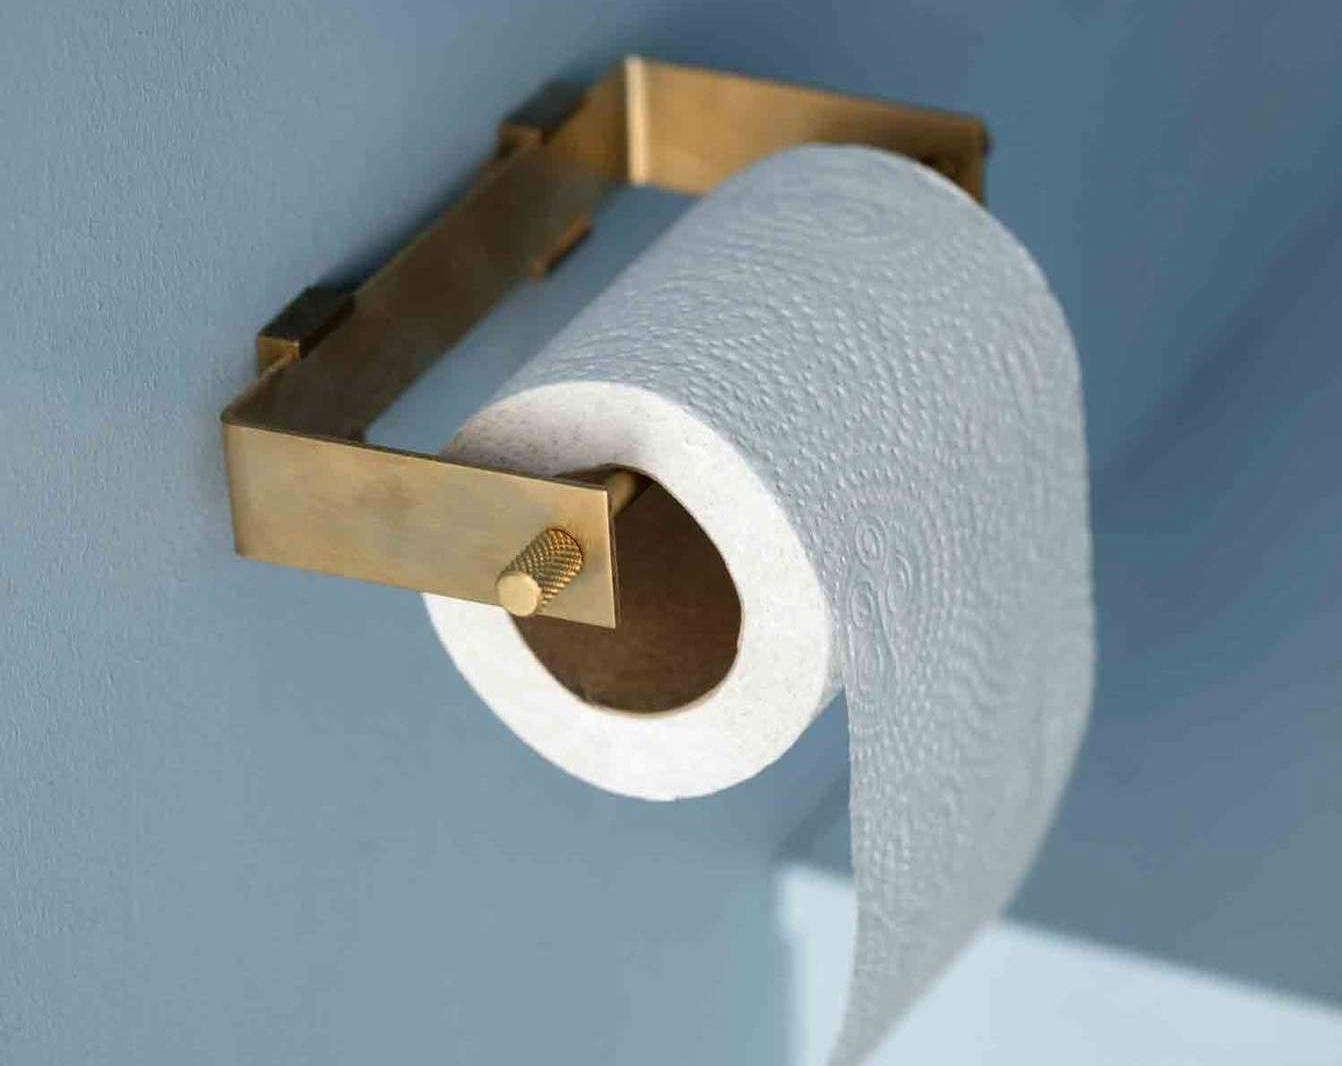 kbh brass toilet paper dispenser copy 1342x1066